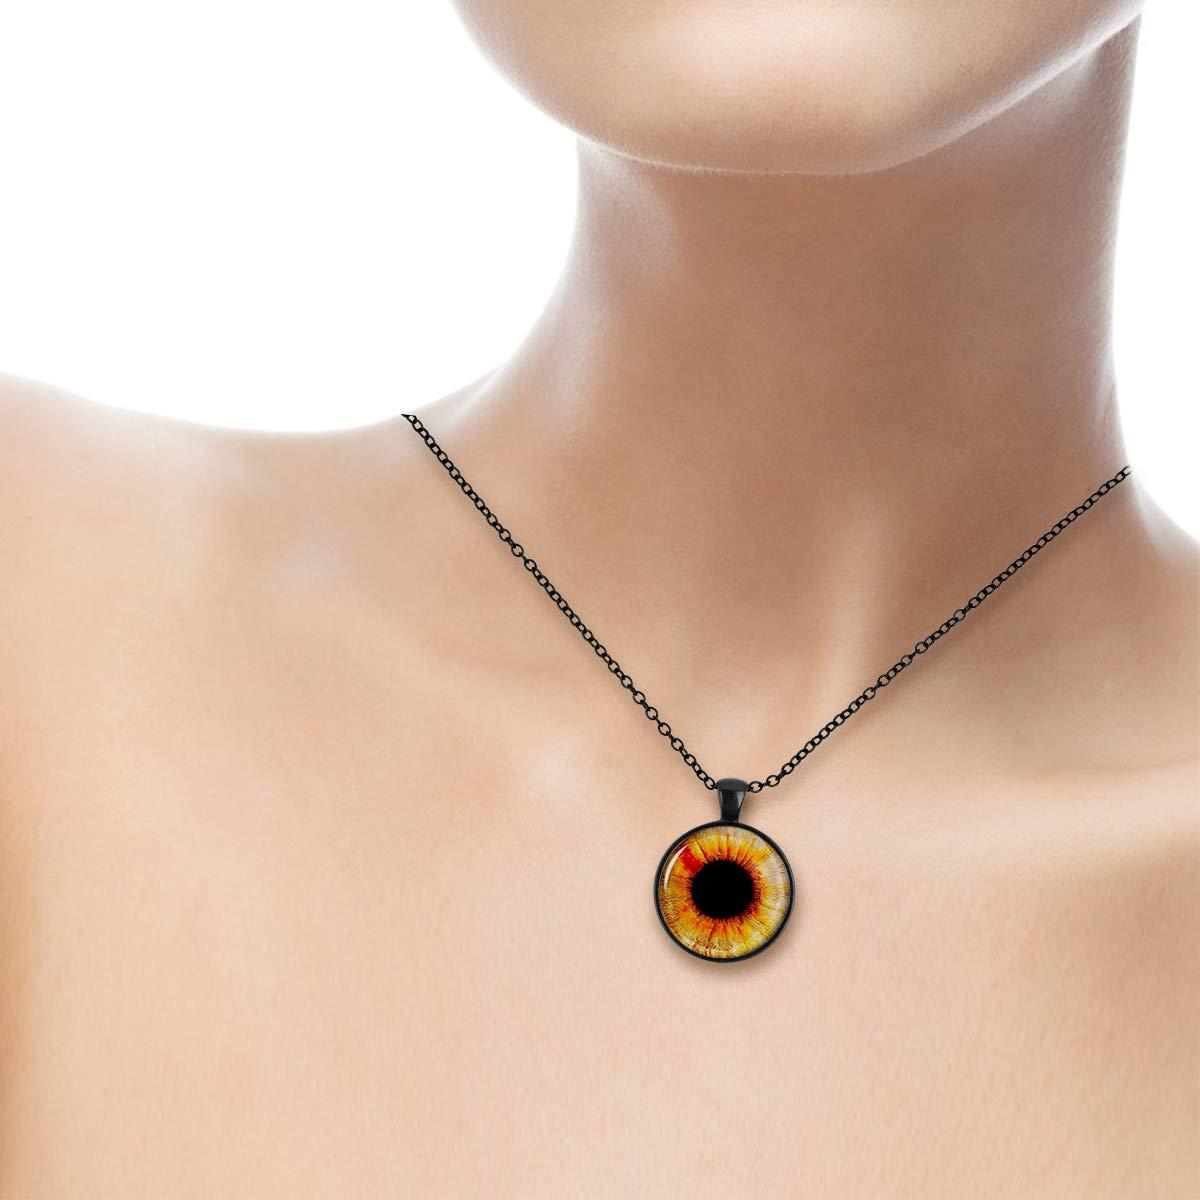 Lightrain Black Pupil Eyeball Pendant Necklace Vintage Bronze Chain Statement Necklace Handmade Jewelry Gifts